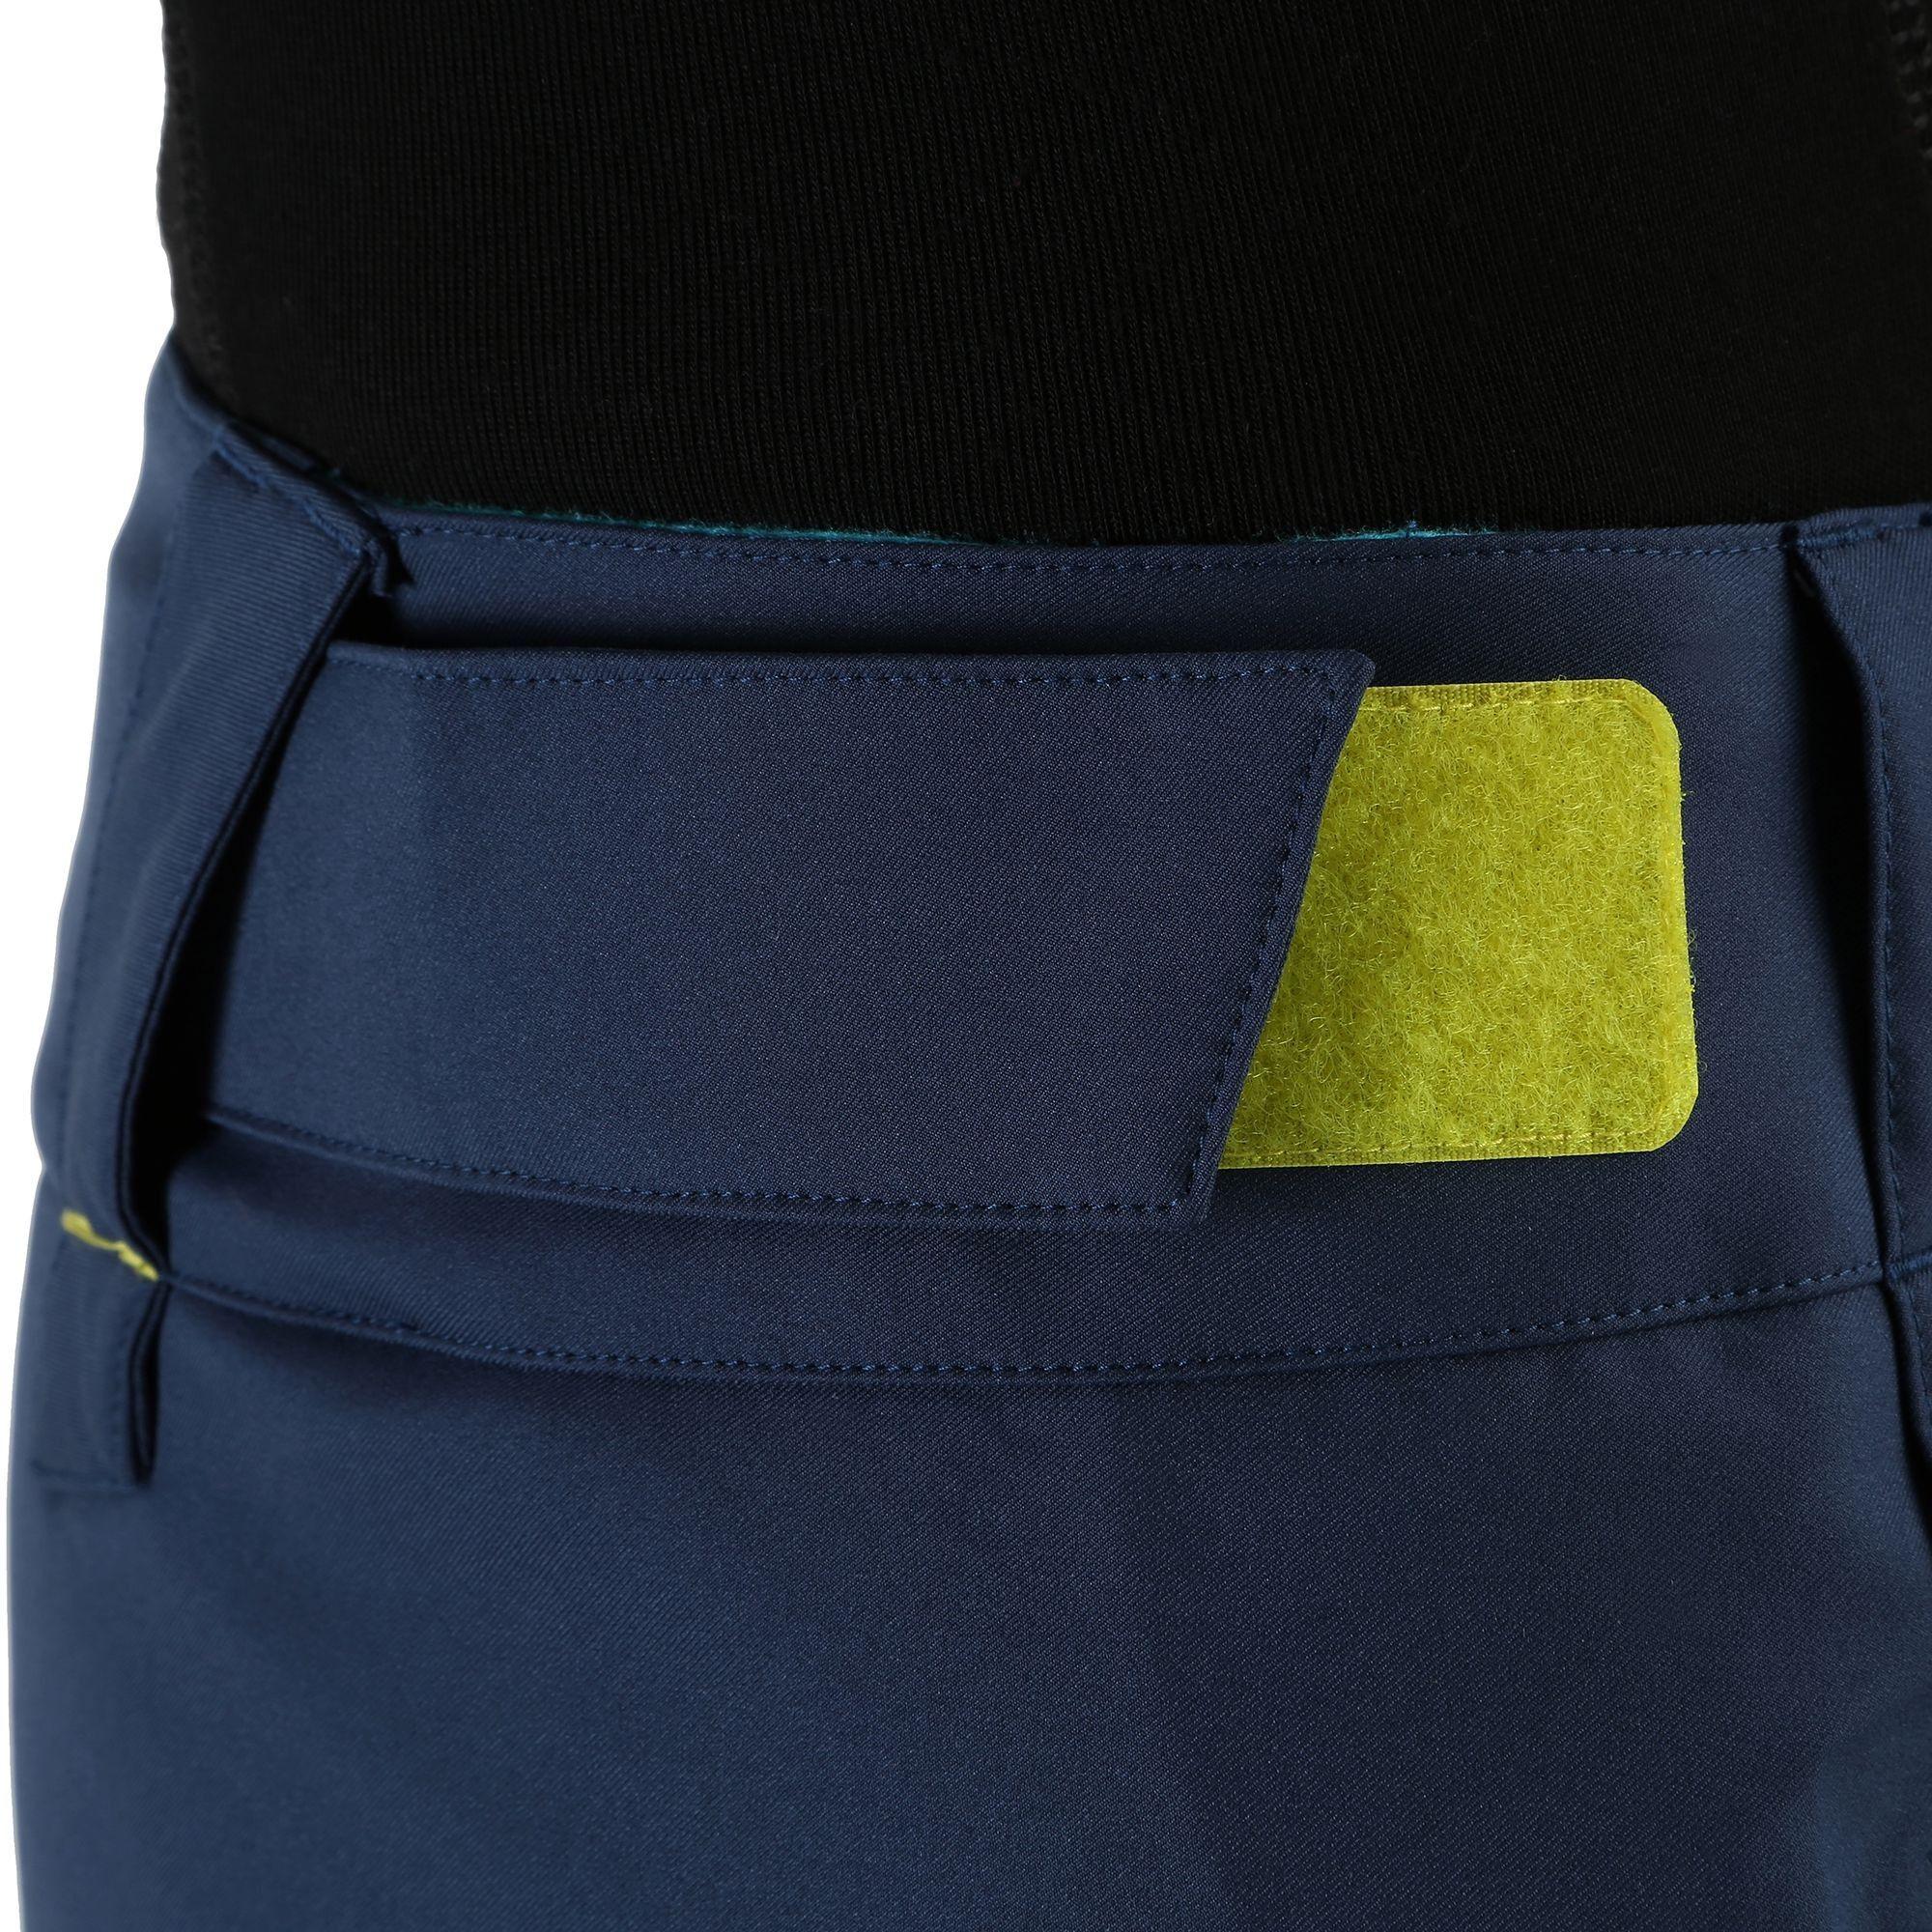 Pantalon Ski Femme Midtrip Decathlon Details In Woman S Fashion